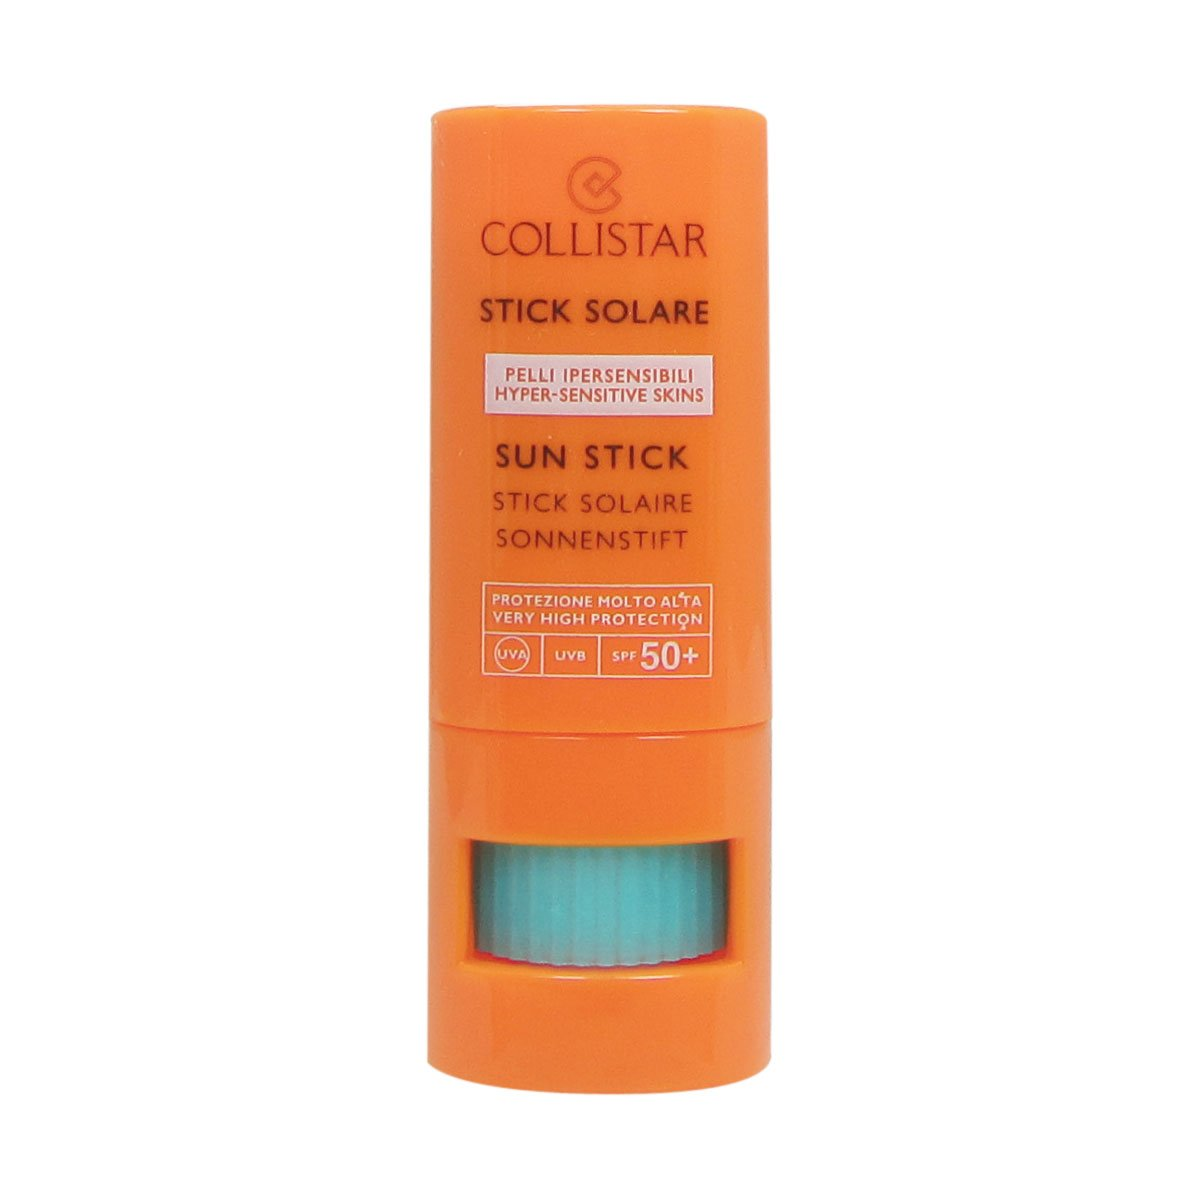 Collistar Maximum Protection Sun Stick Spf50+ Hyper Sensitive Skin 8ml